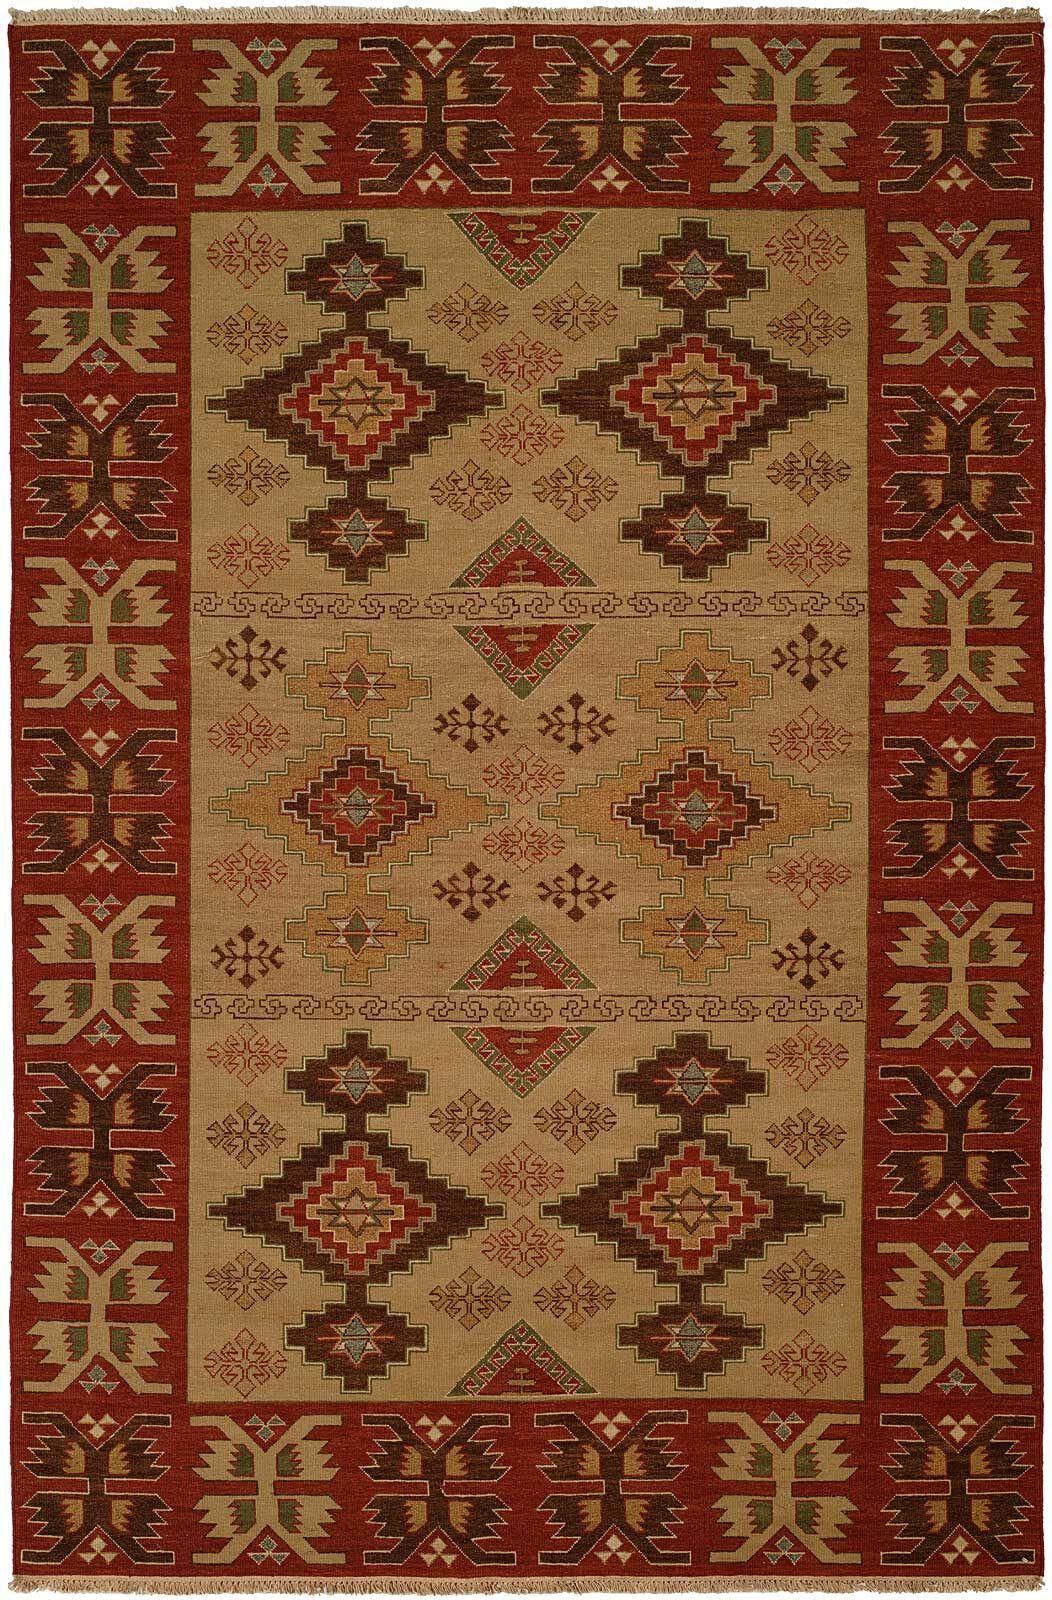 Yingkou Hand-Woven Brown/Red Area Rug Rug Size: Rectangle 4' x 10'